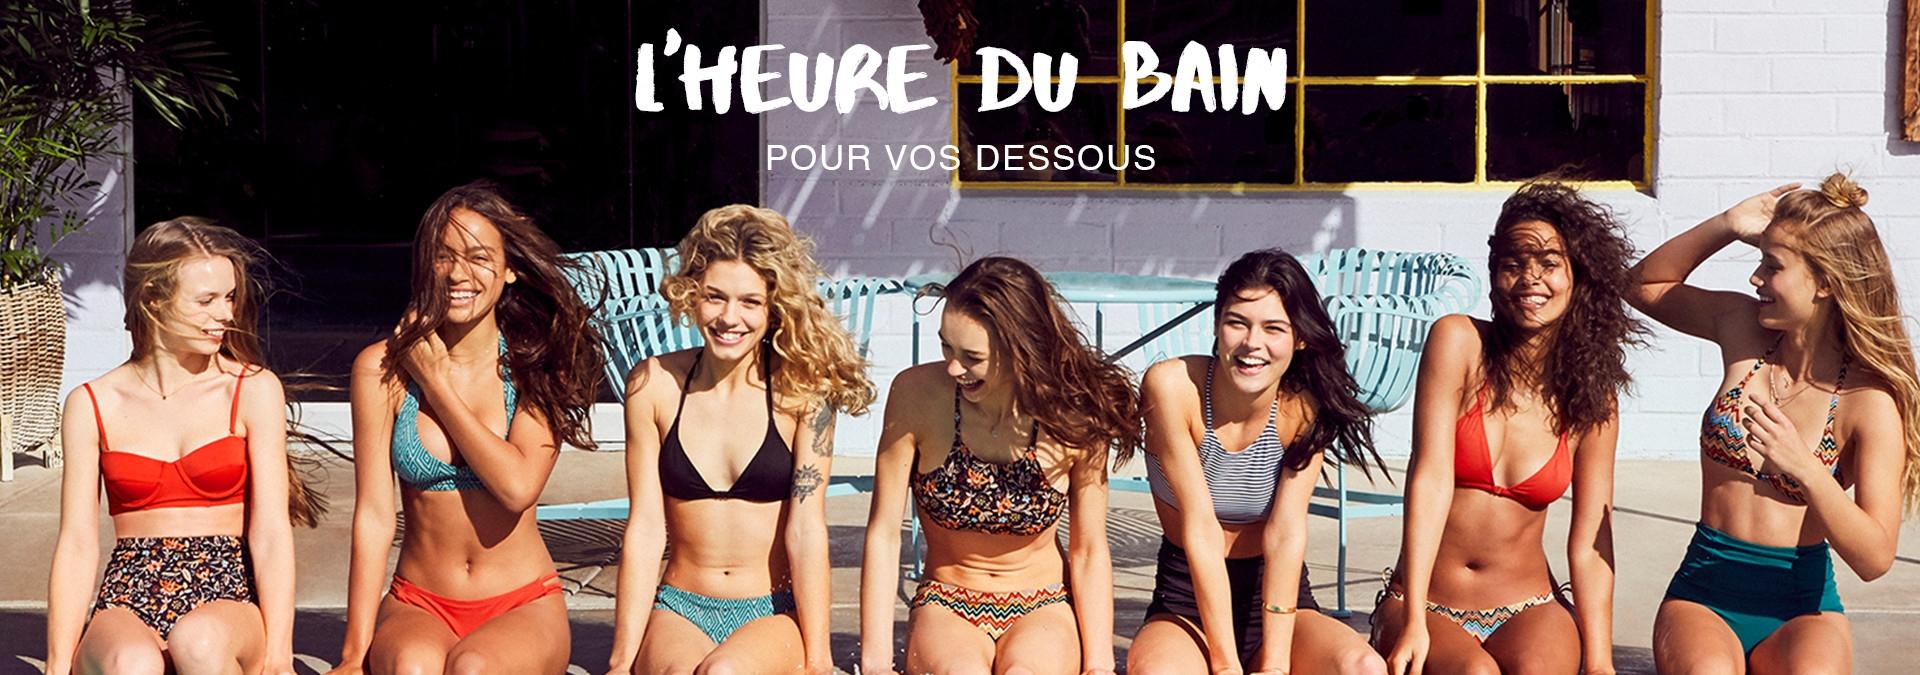 urban -outfitters – maillots  de bain rétro – Dealabs